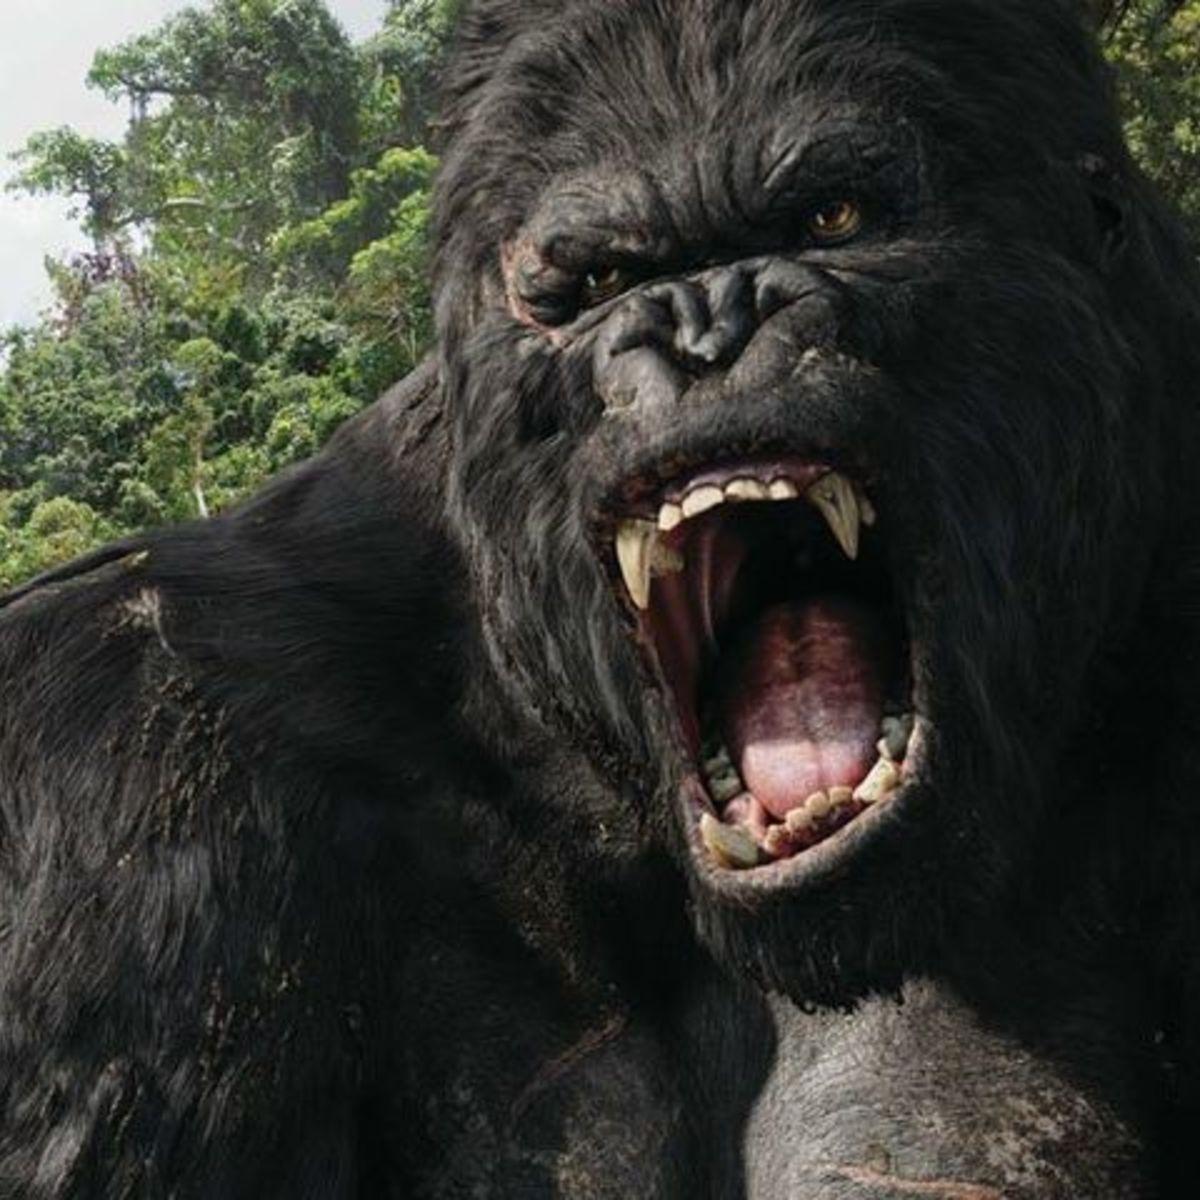 King-Kong-movie_0.jpg